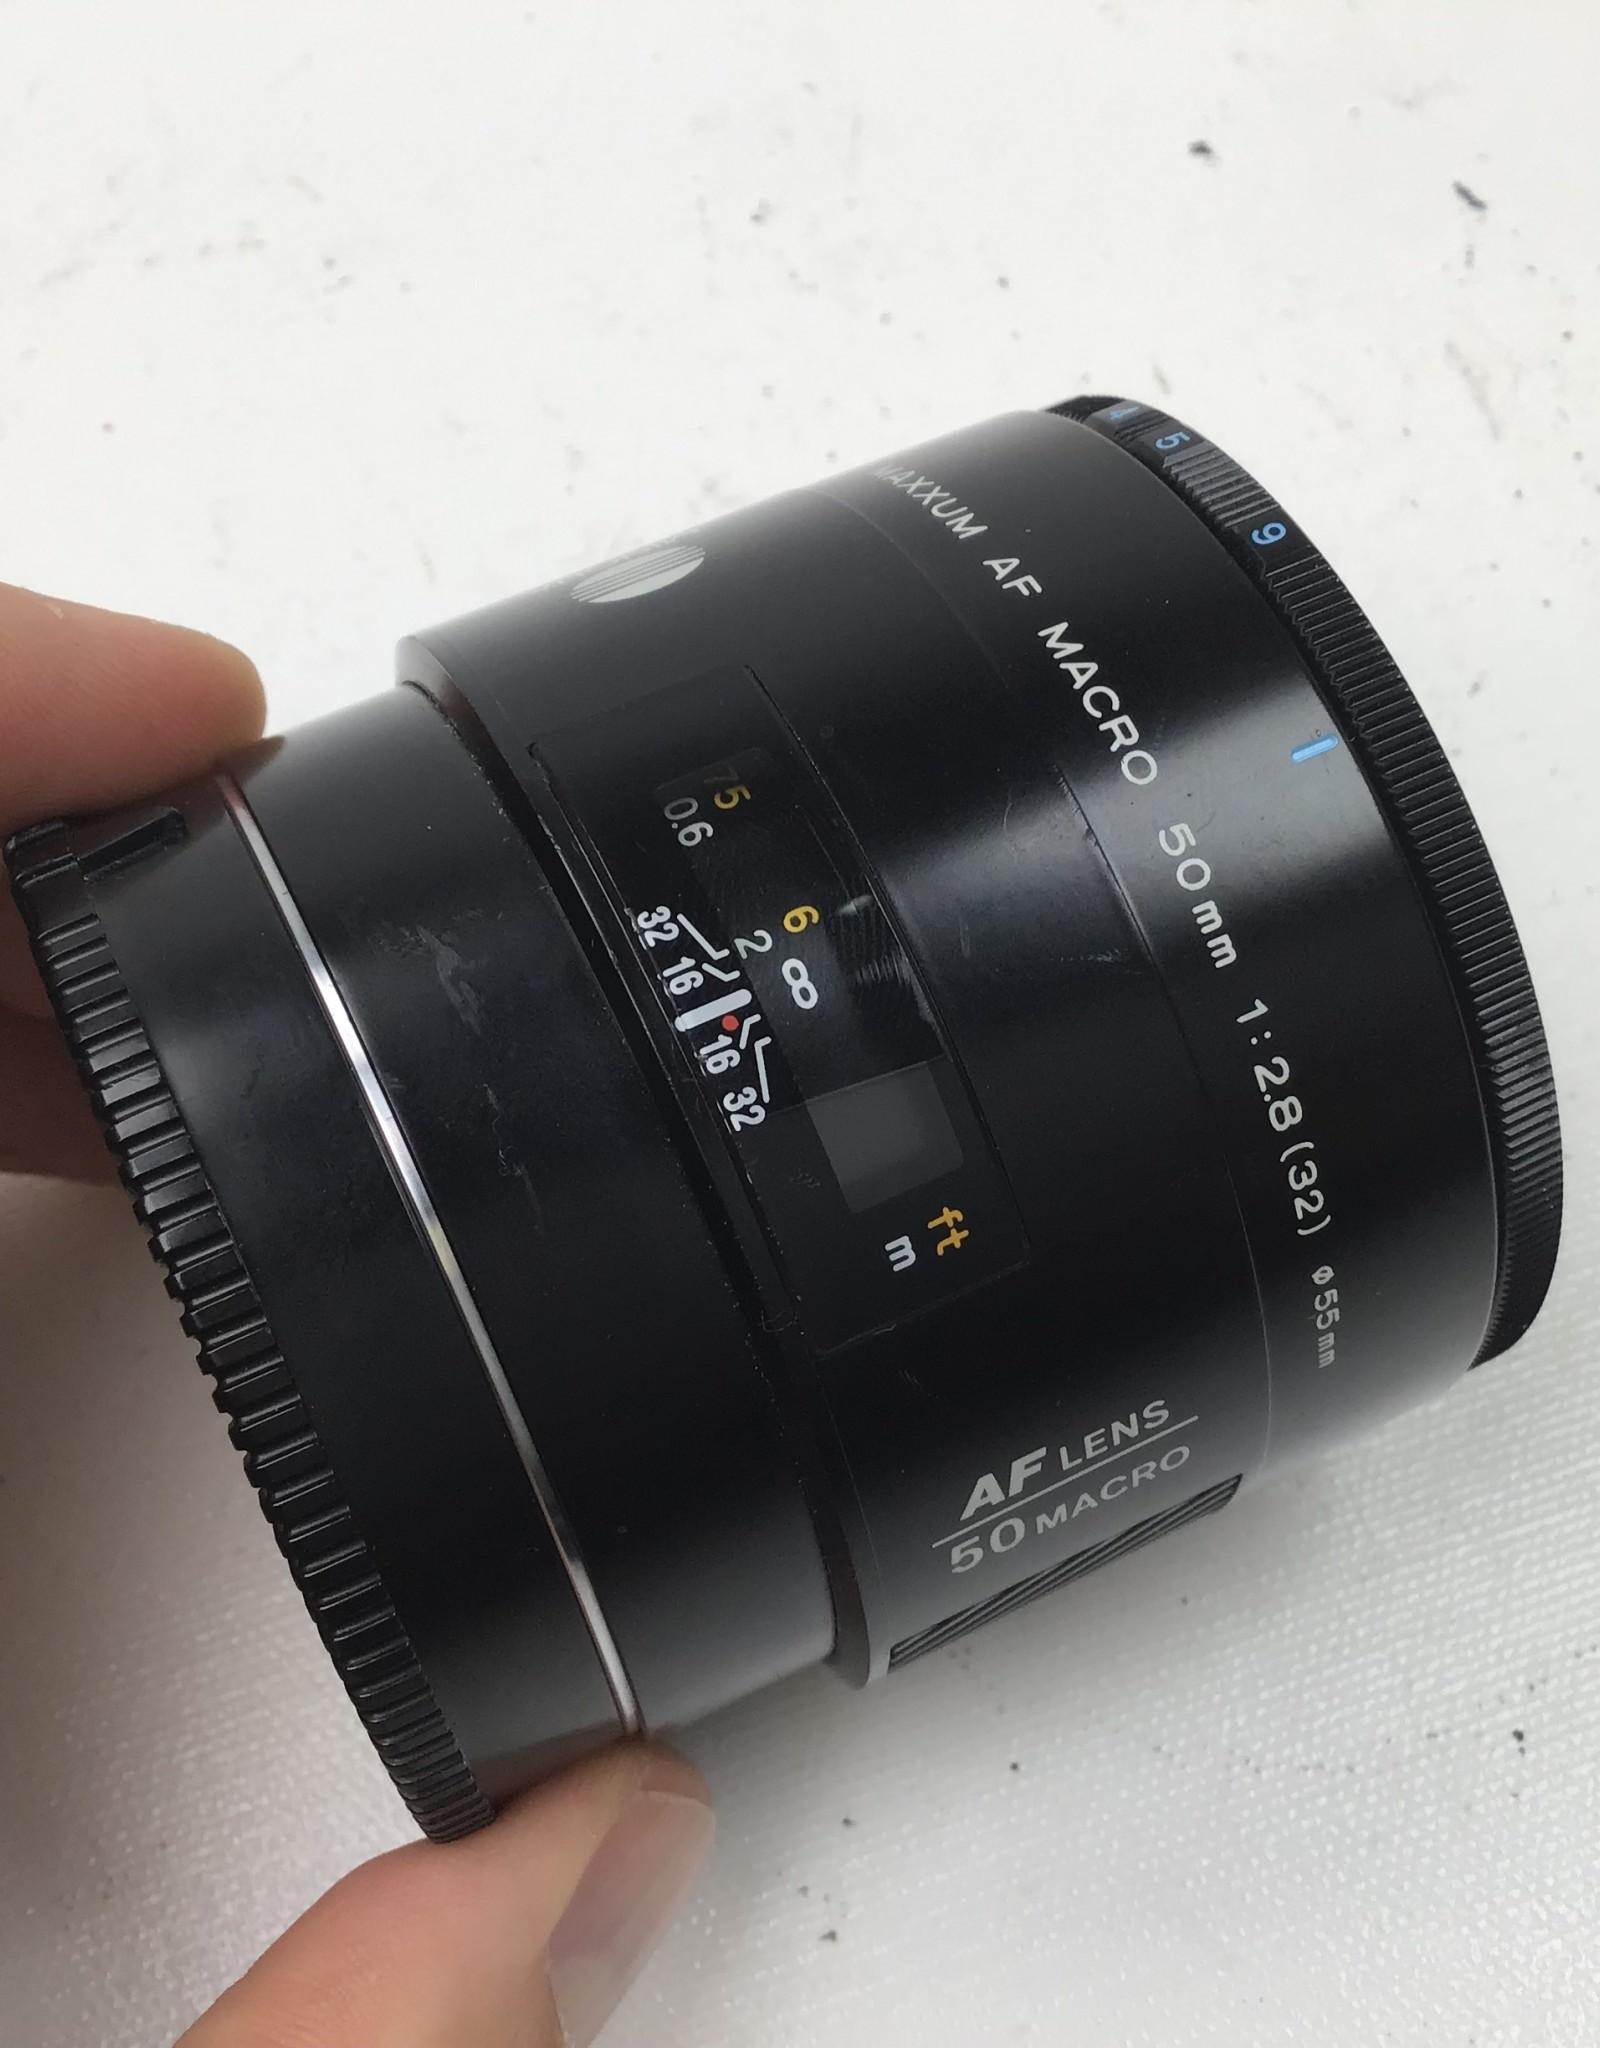 Minolta Minolta Maxxum AF Macro 50mm f2.8 Lens Used Good